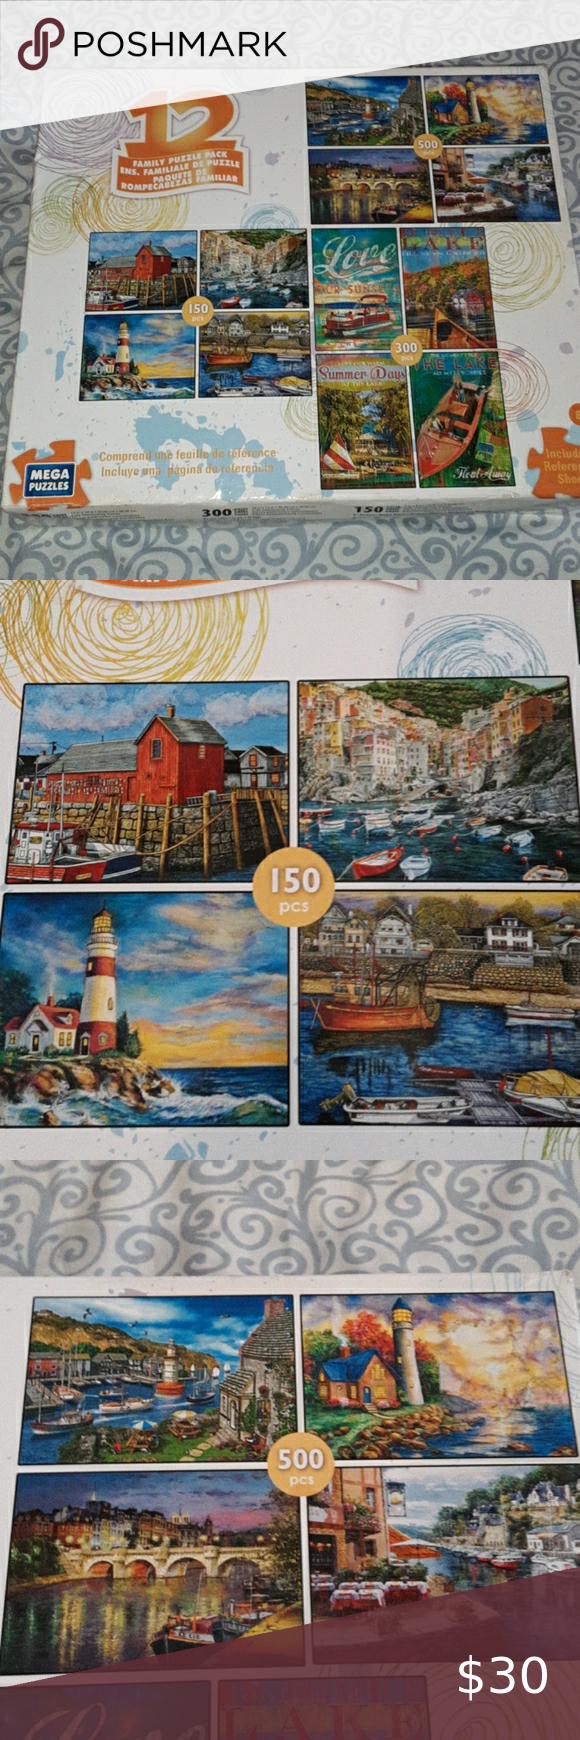 12 Puzzle Family Pack Puzzle Party Vintage World Maps Peices